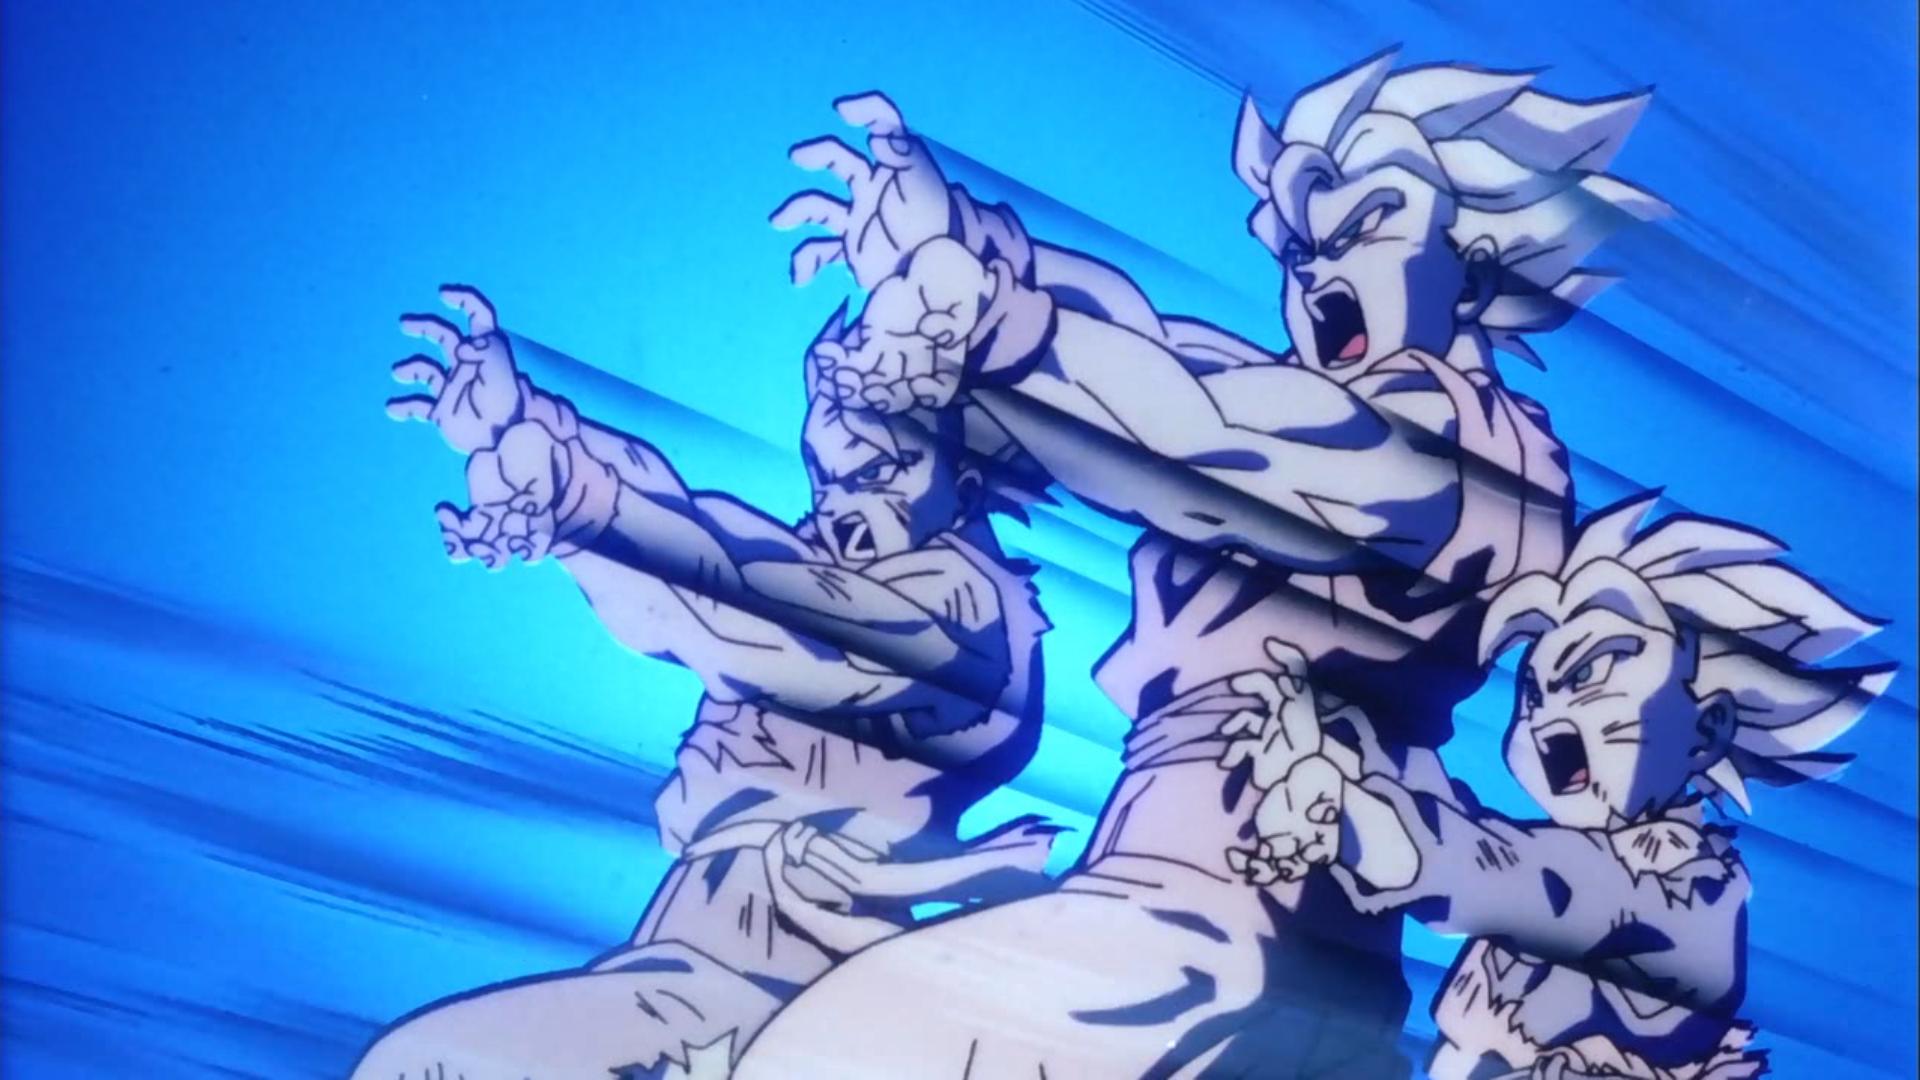 Father And Son S Goku Gohan Y Goten Kamehameha 1920x1080 Wallpaper Teahub Io